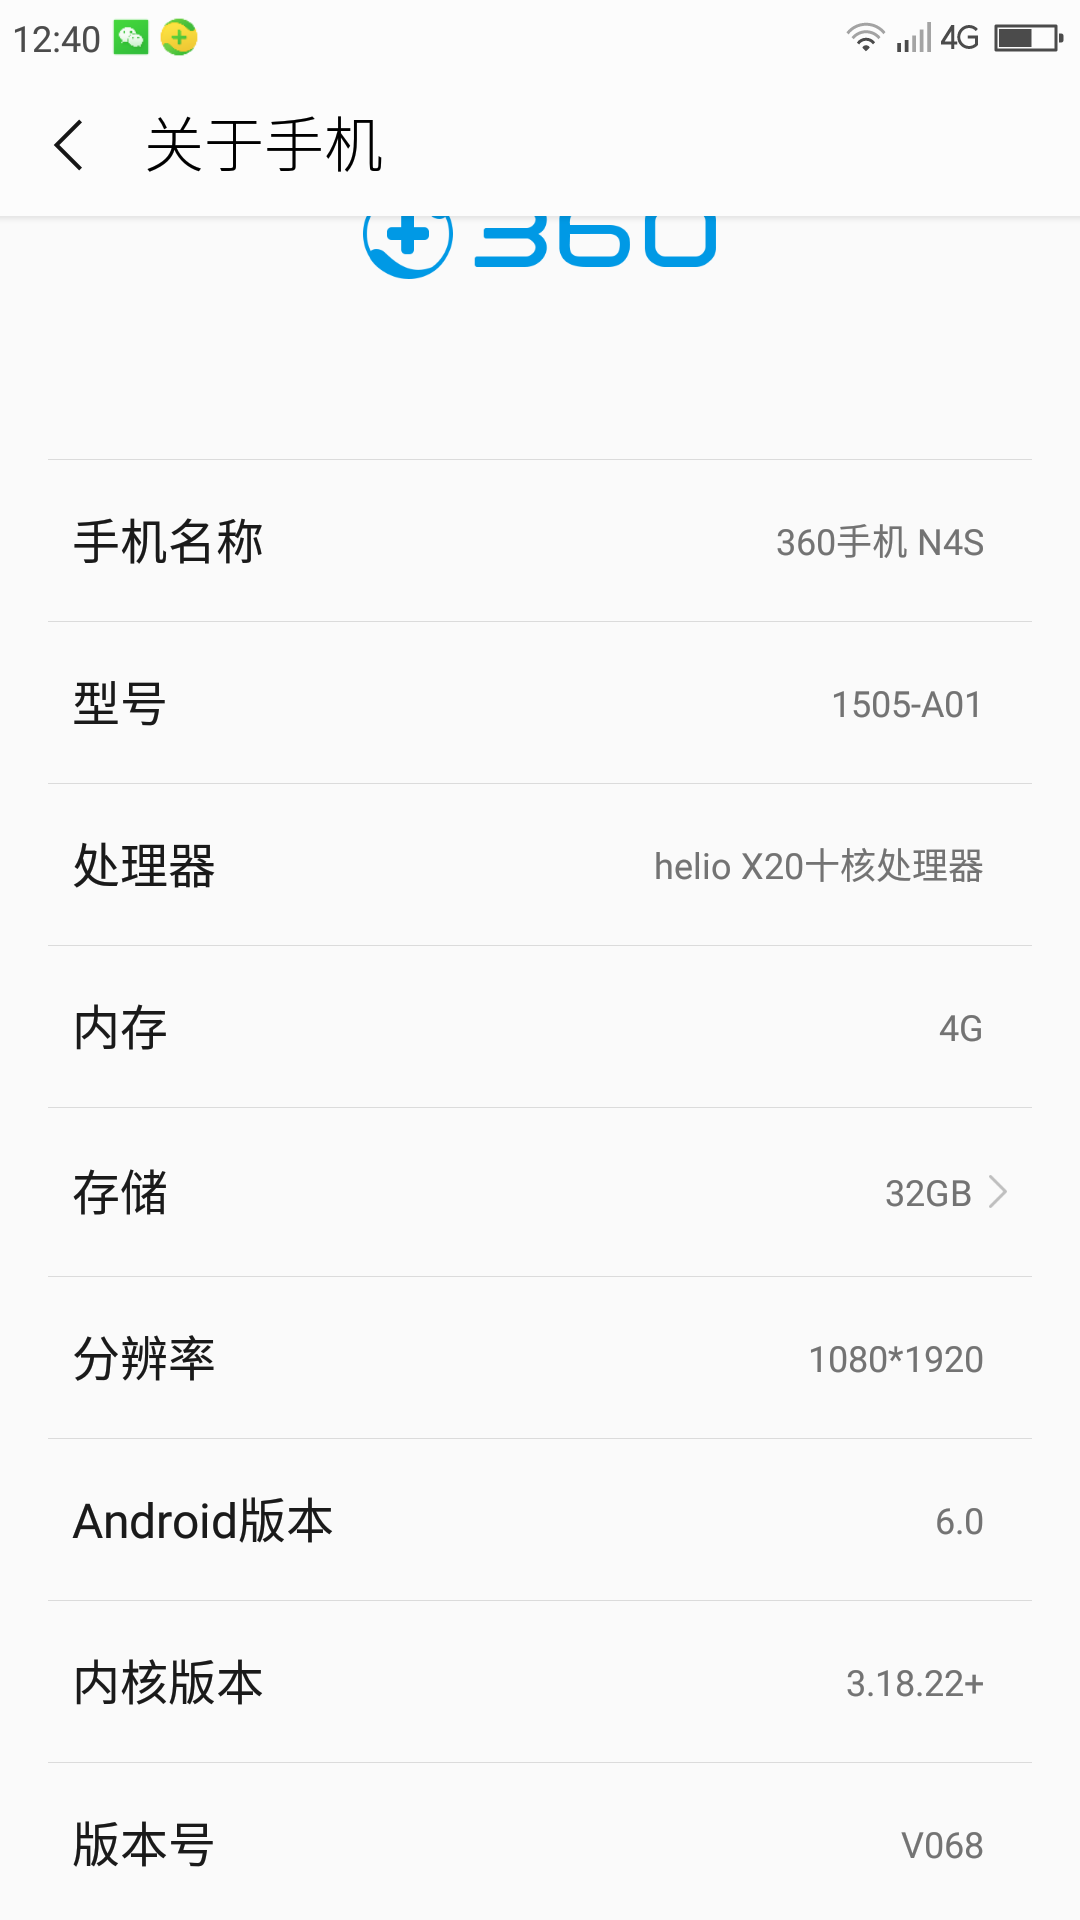 Screenshot_2017-04-08-12-40-43.png